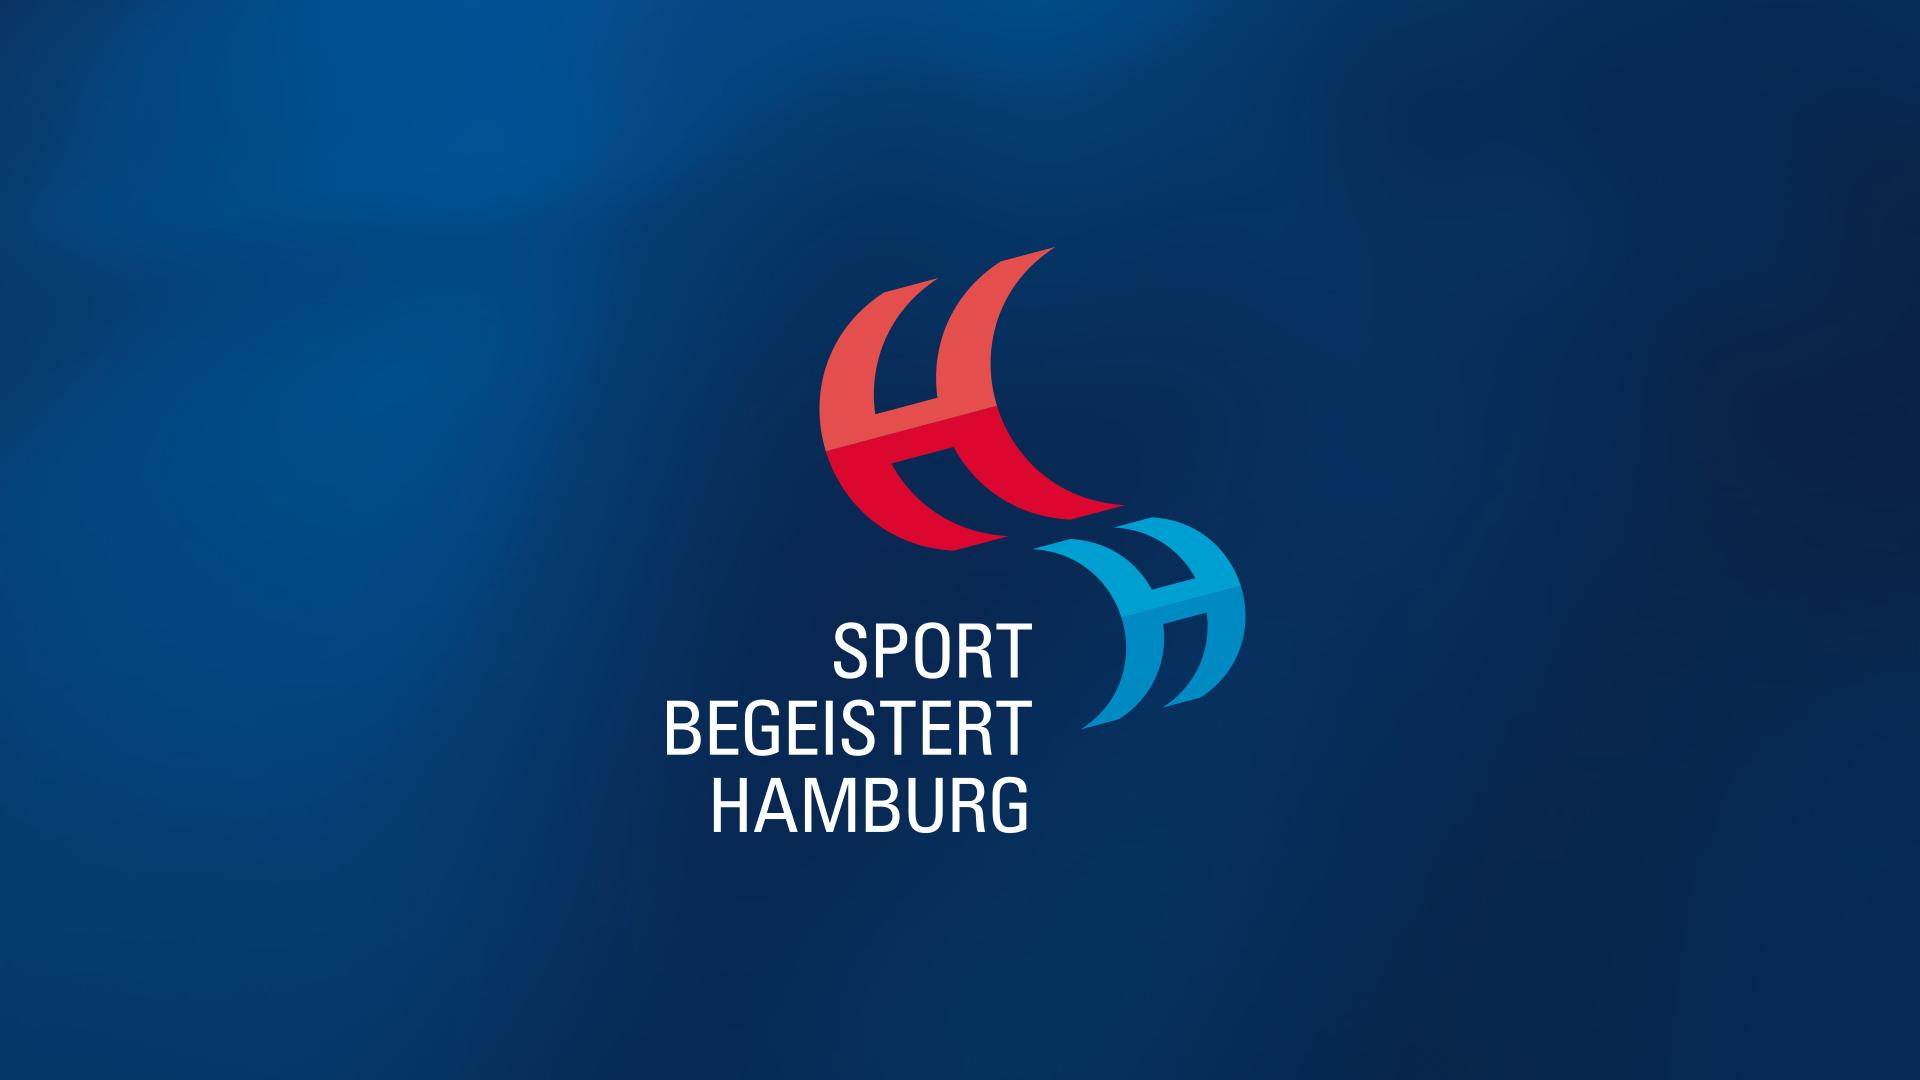 Sportstadt Hamburg Logodesign ©gobasil ~ Agentur für Kommunikation, Hamburg Hannover